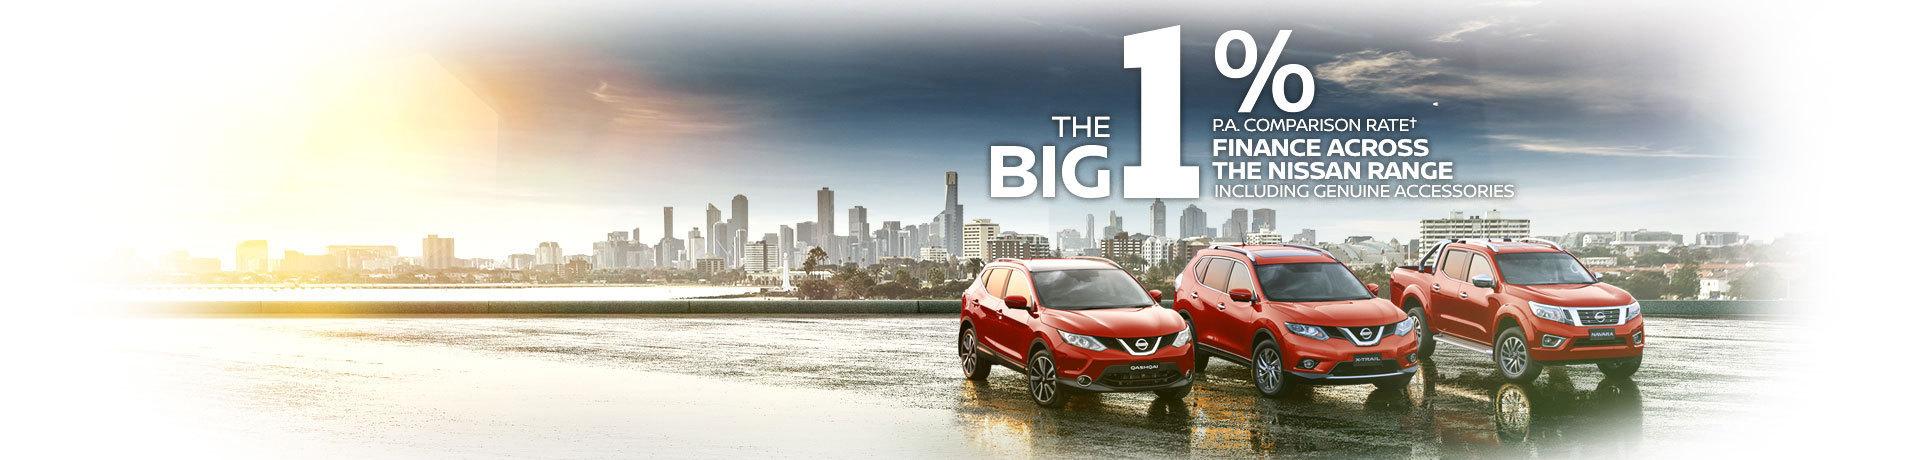 The Big 1% Comparisson Rate Finance Across The Nissan Range